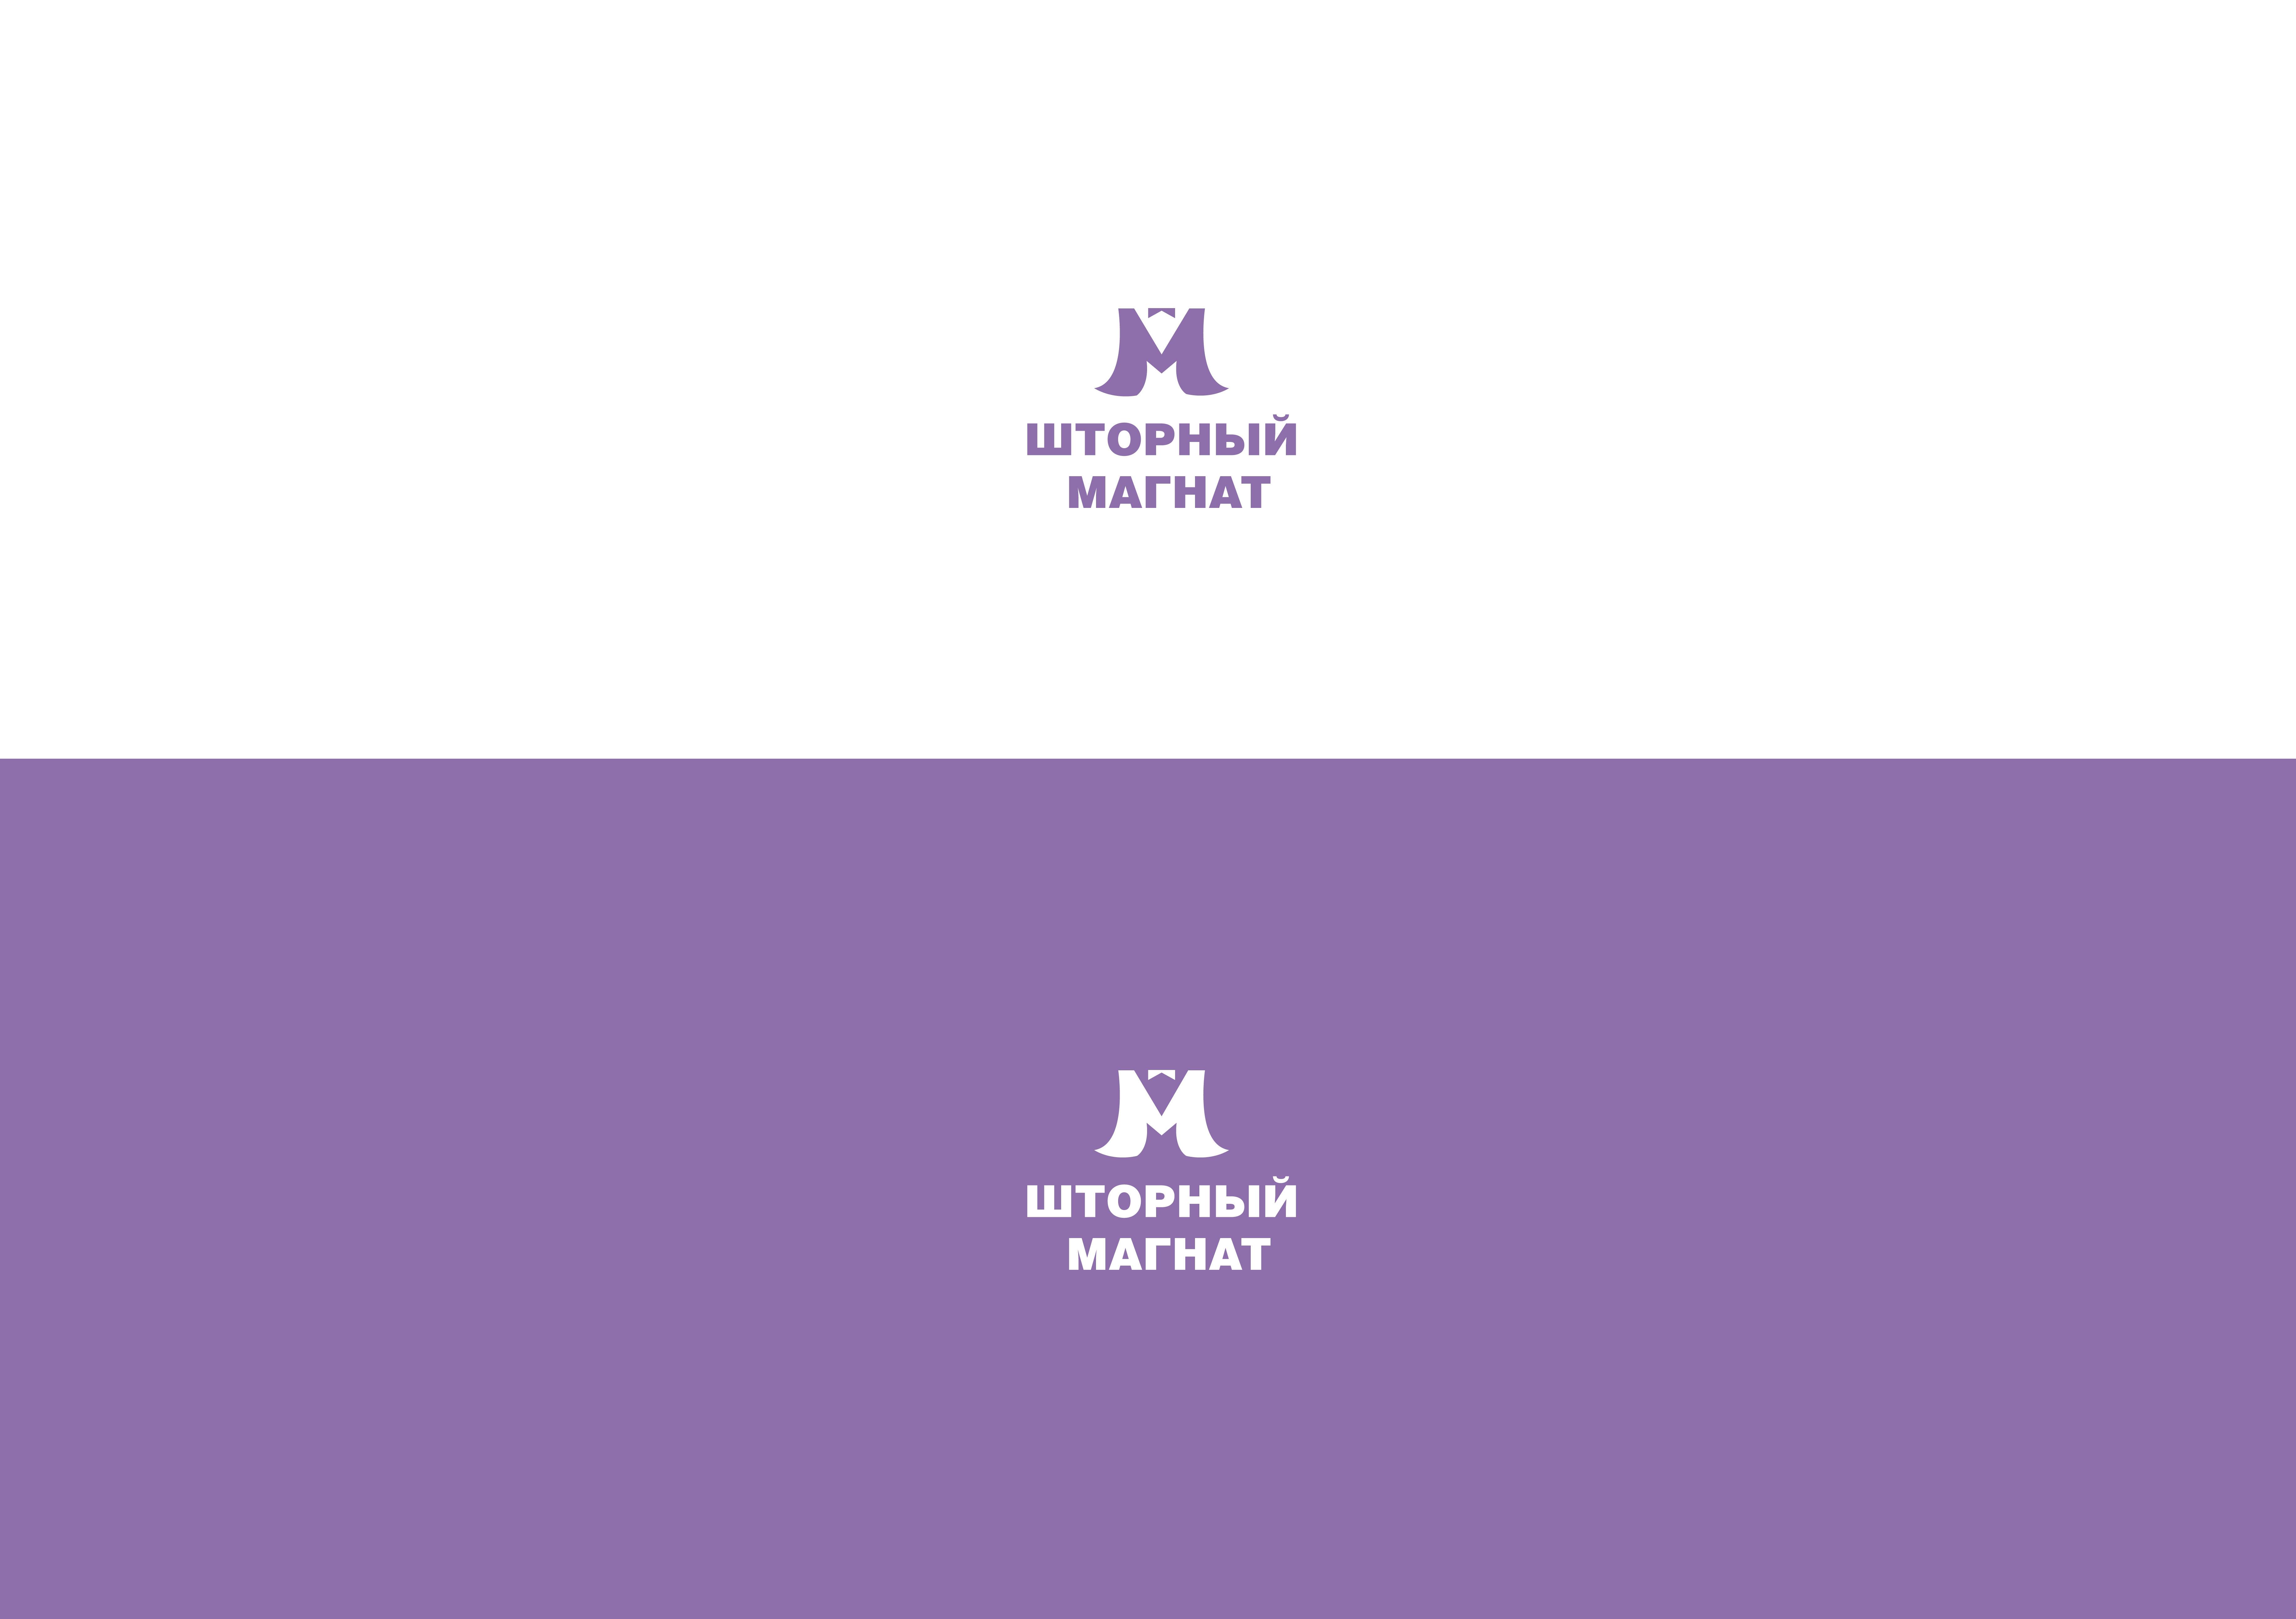 Логотип и фирменный стиль для магазина тканей. фото f_2875cdb9e3e65b14.jpg